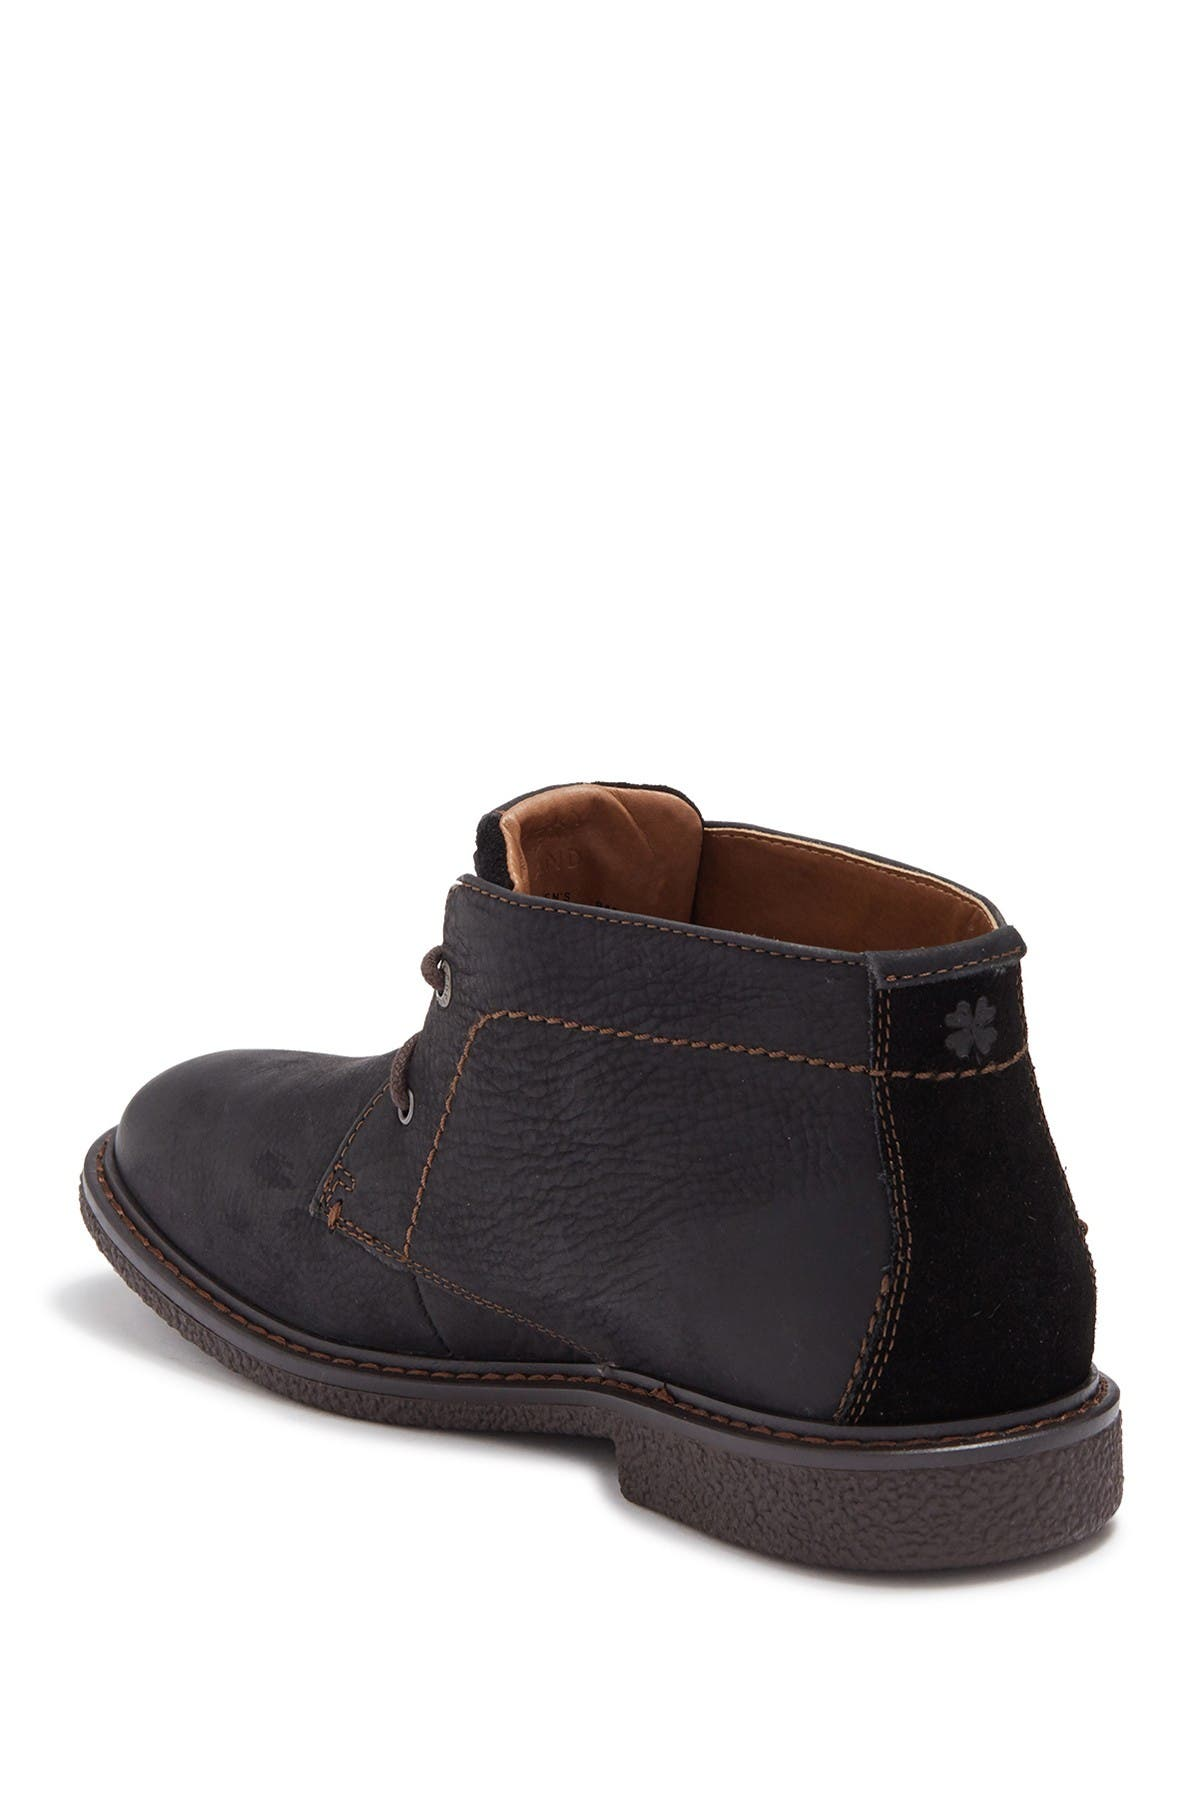 Image of Lucky Brand Boone Chukka Boot